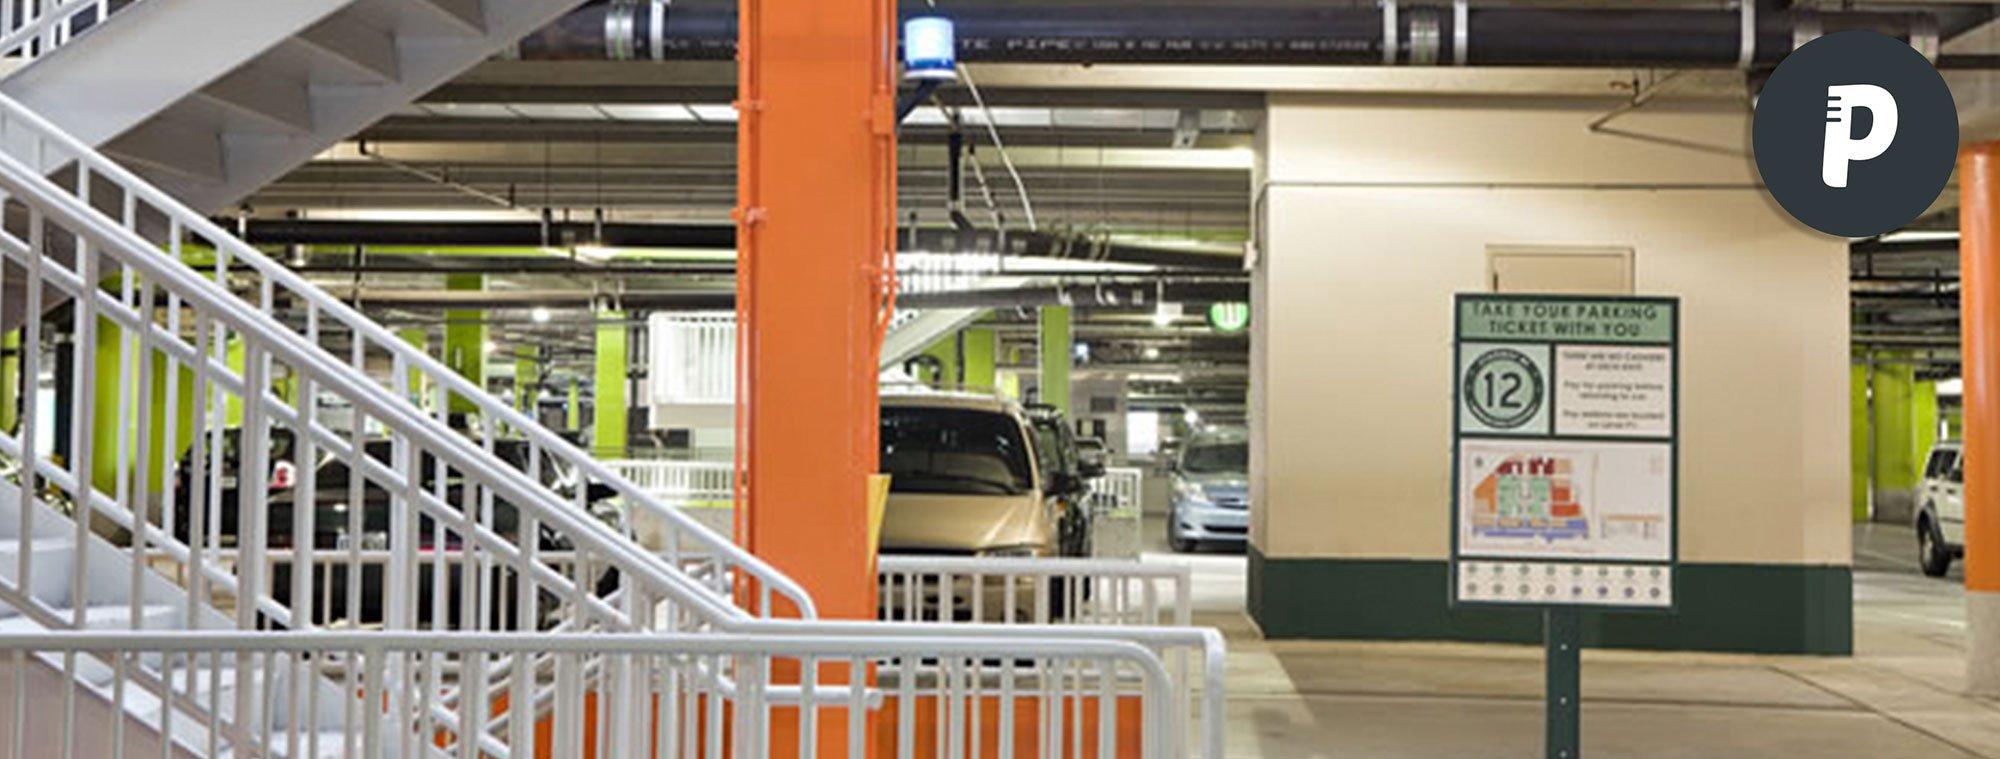 Atlantic Station Parking